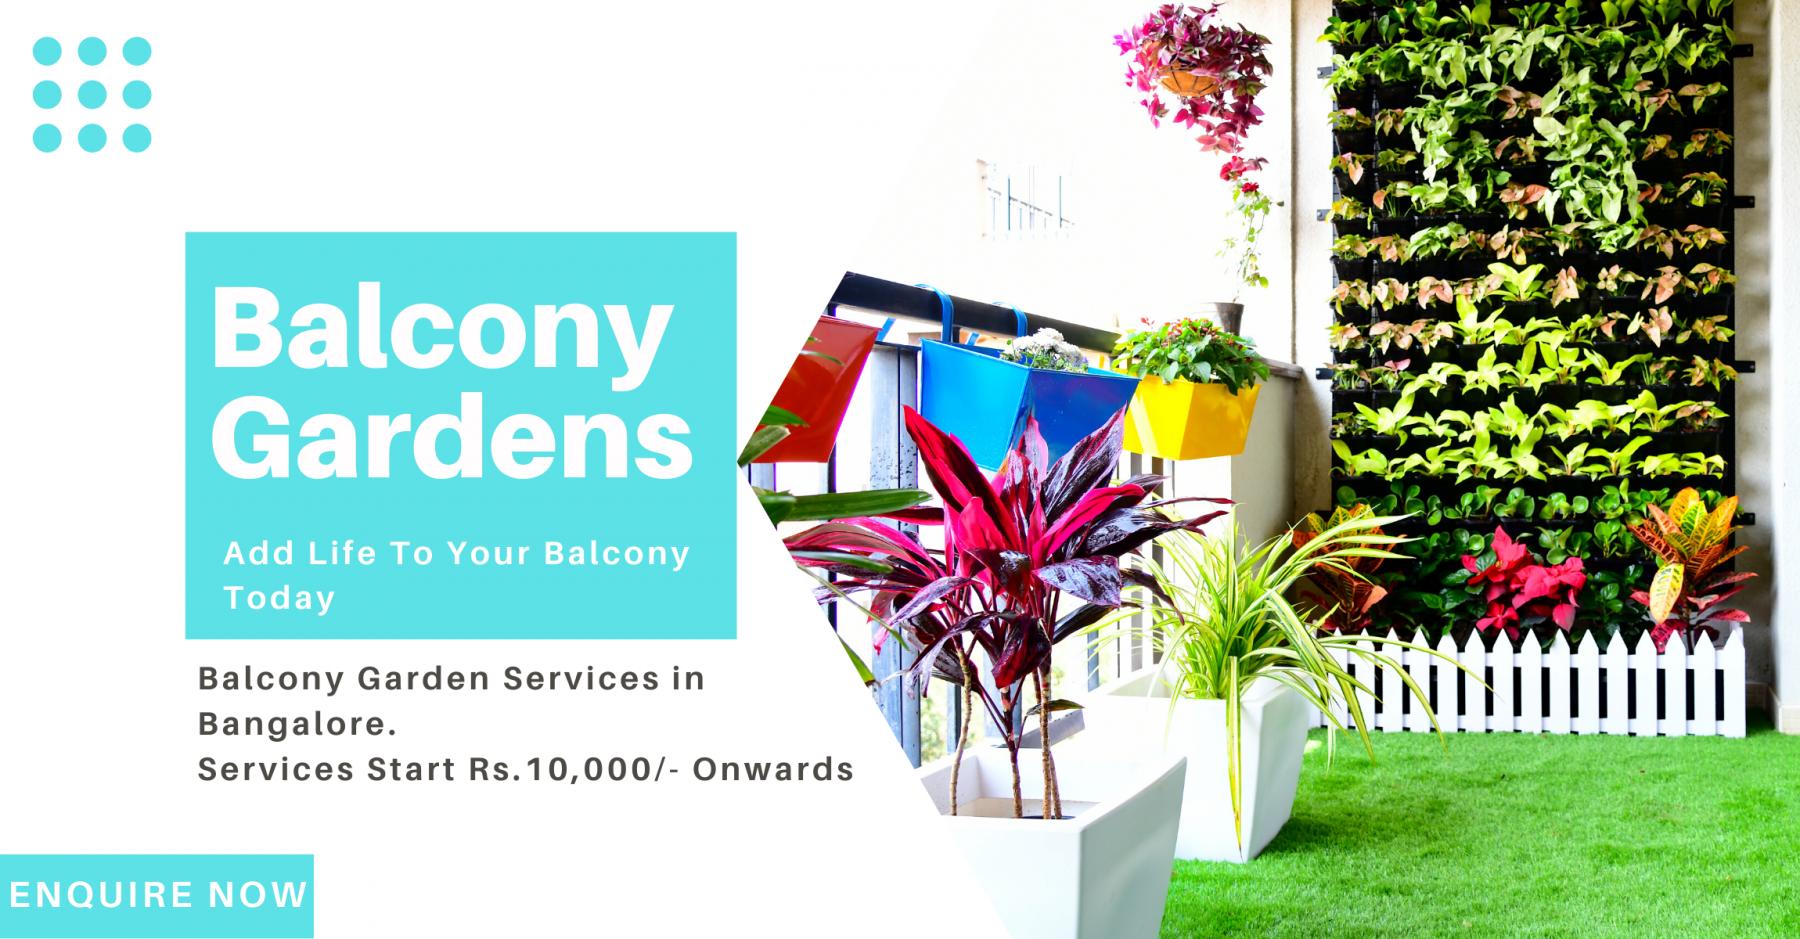 Balcony Gardens Bangalore